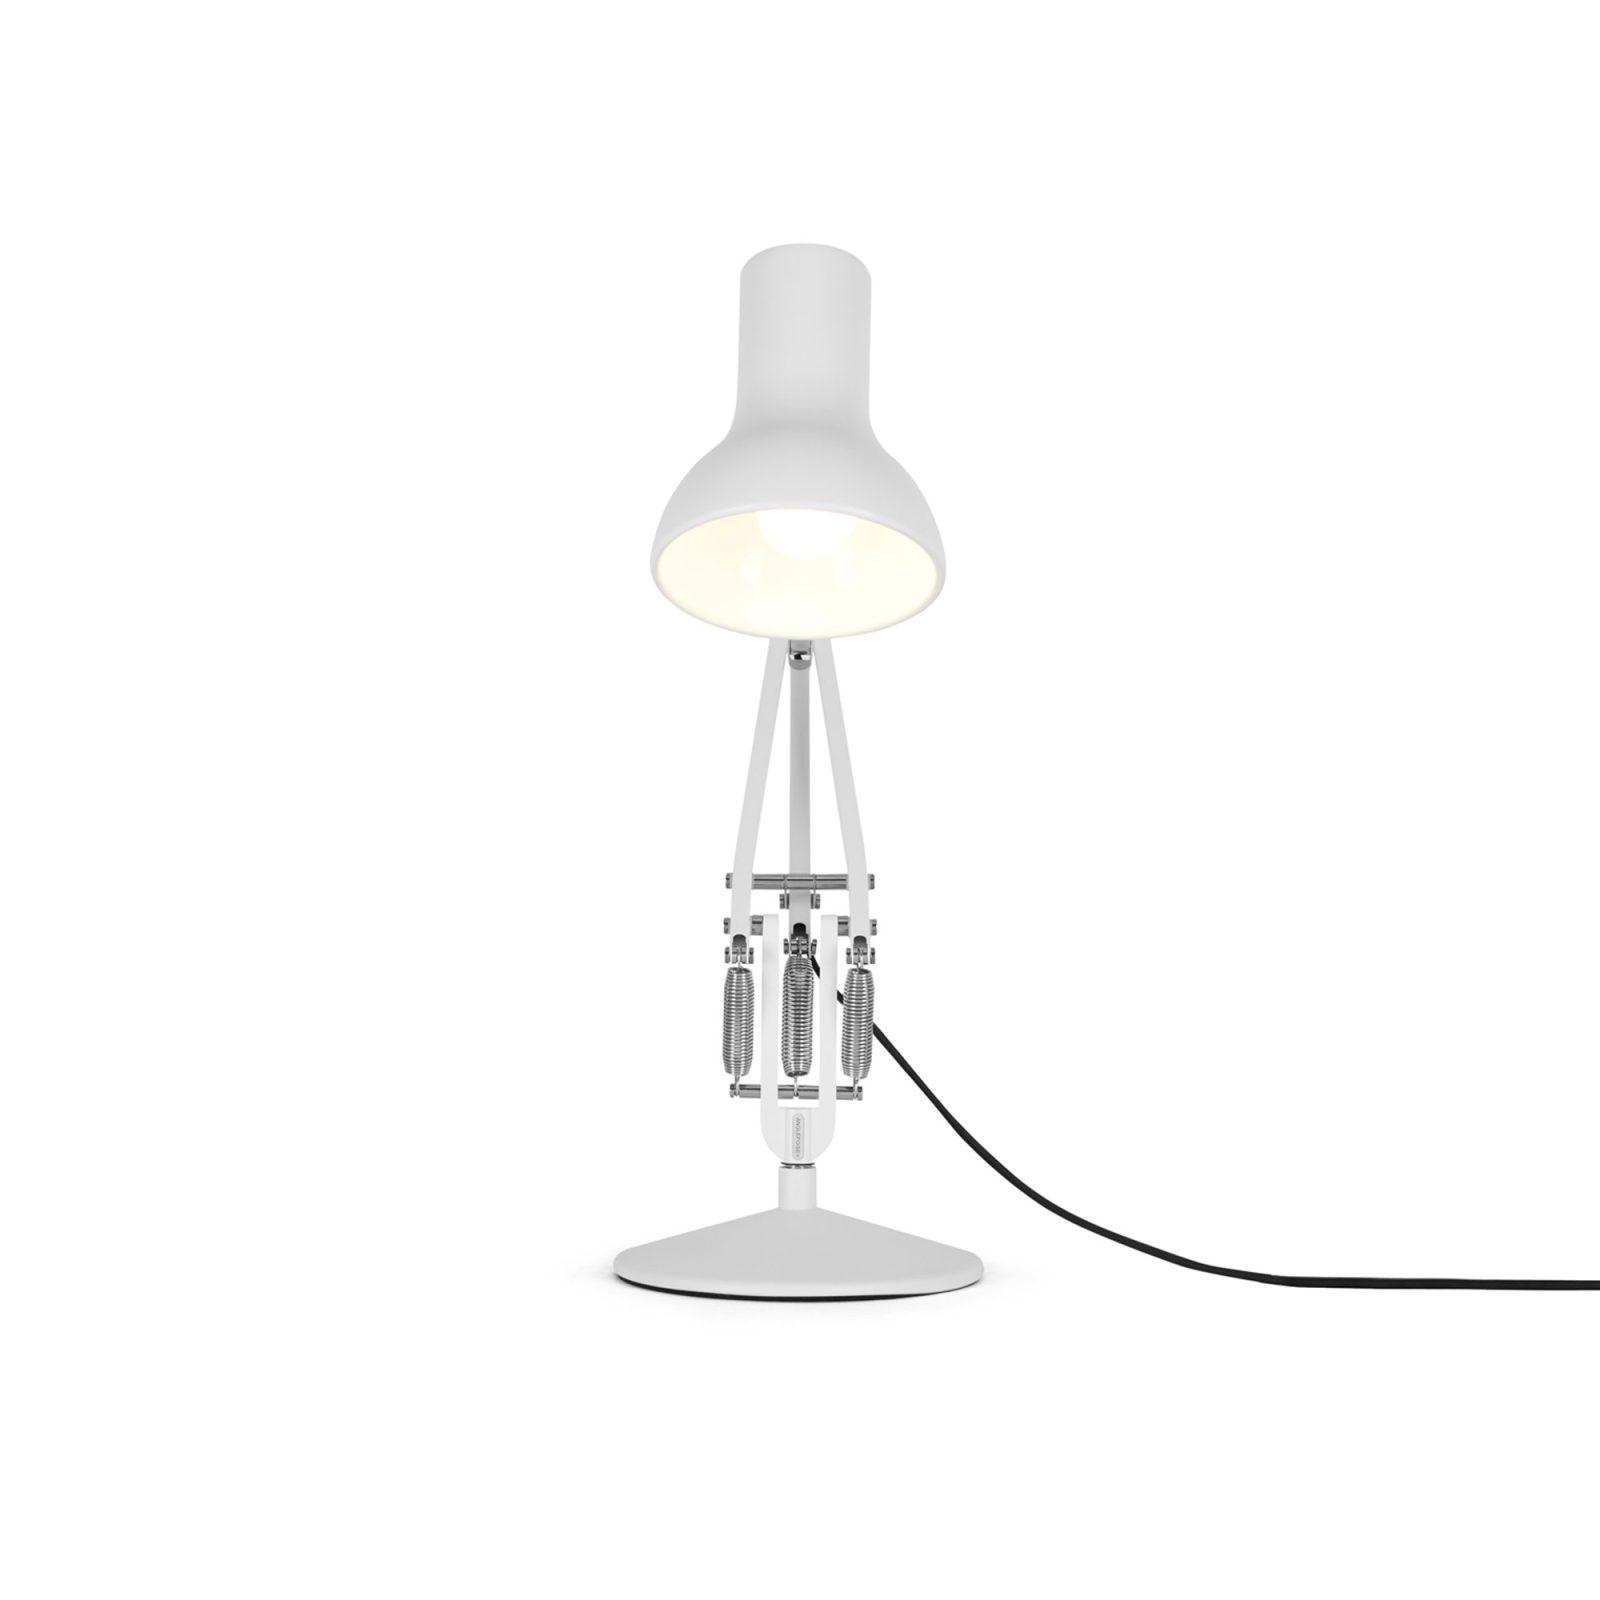 type-75-mini-desk-lamp-1